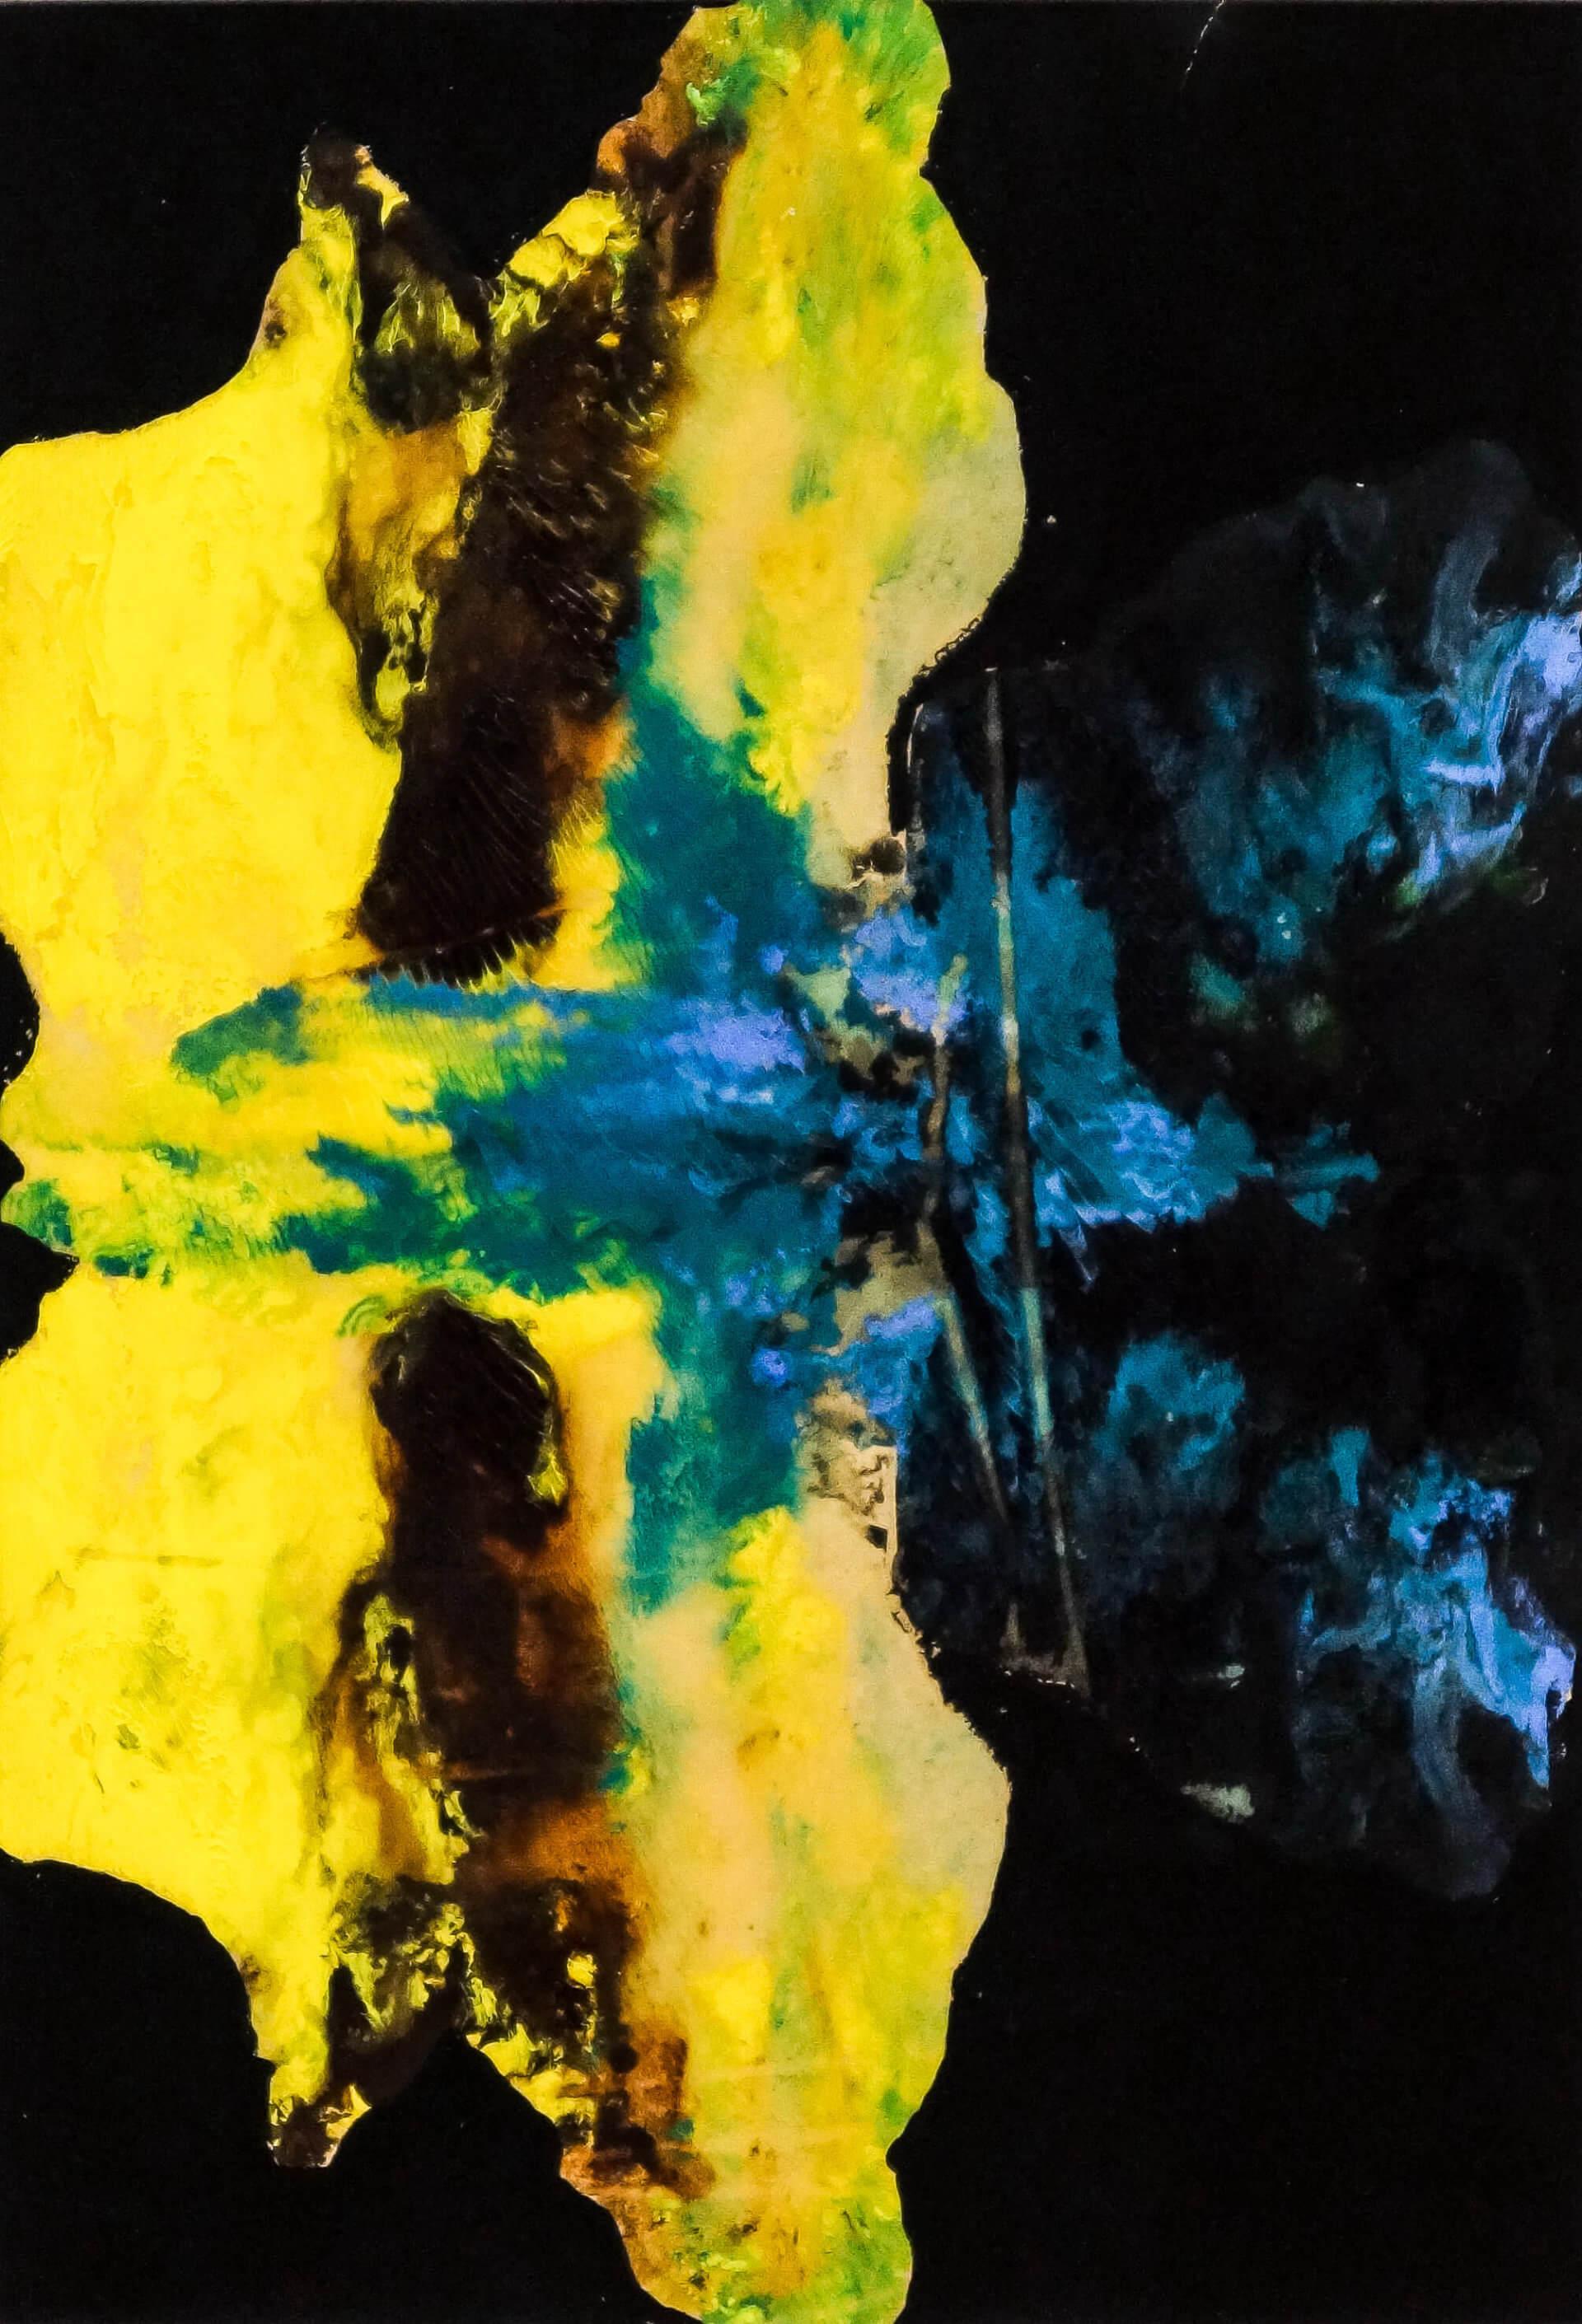 Katharina Albers, Wald XXVIII, 2014, Ölfarbe, Linolfarbe auf Papier, 29,7×21 cm